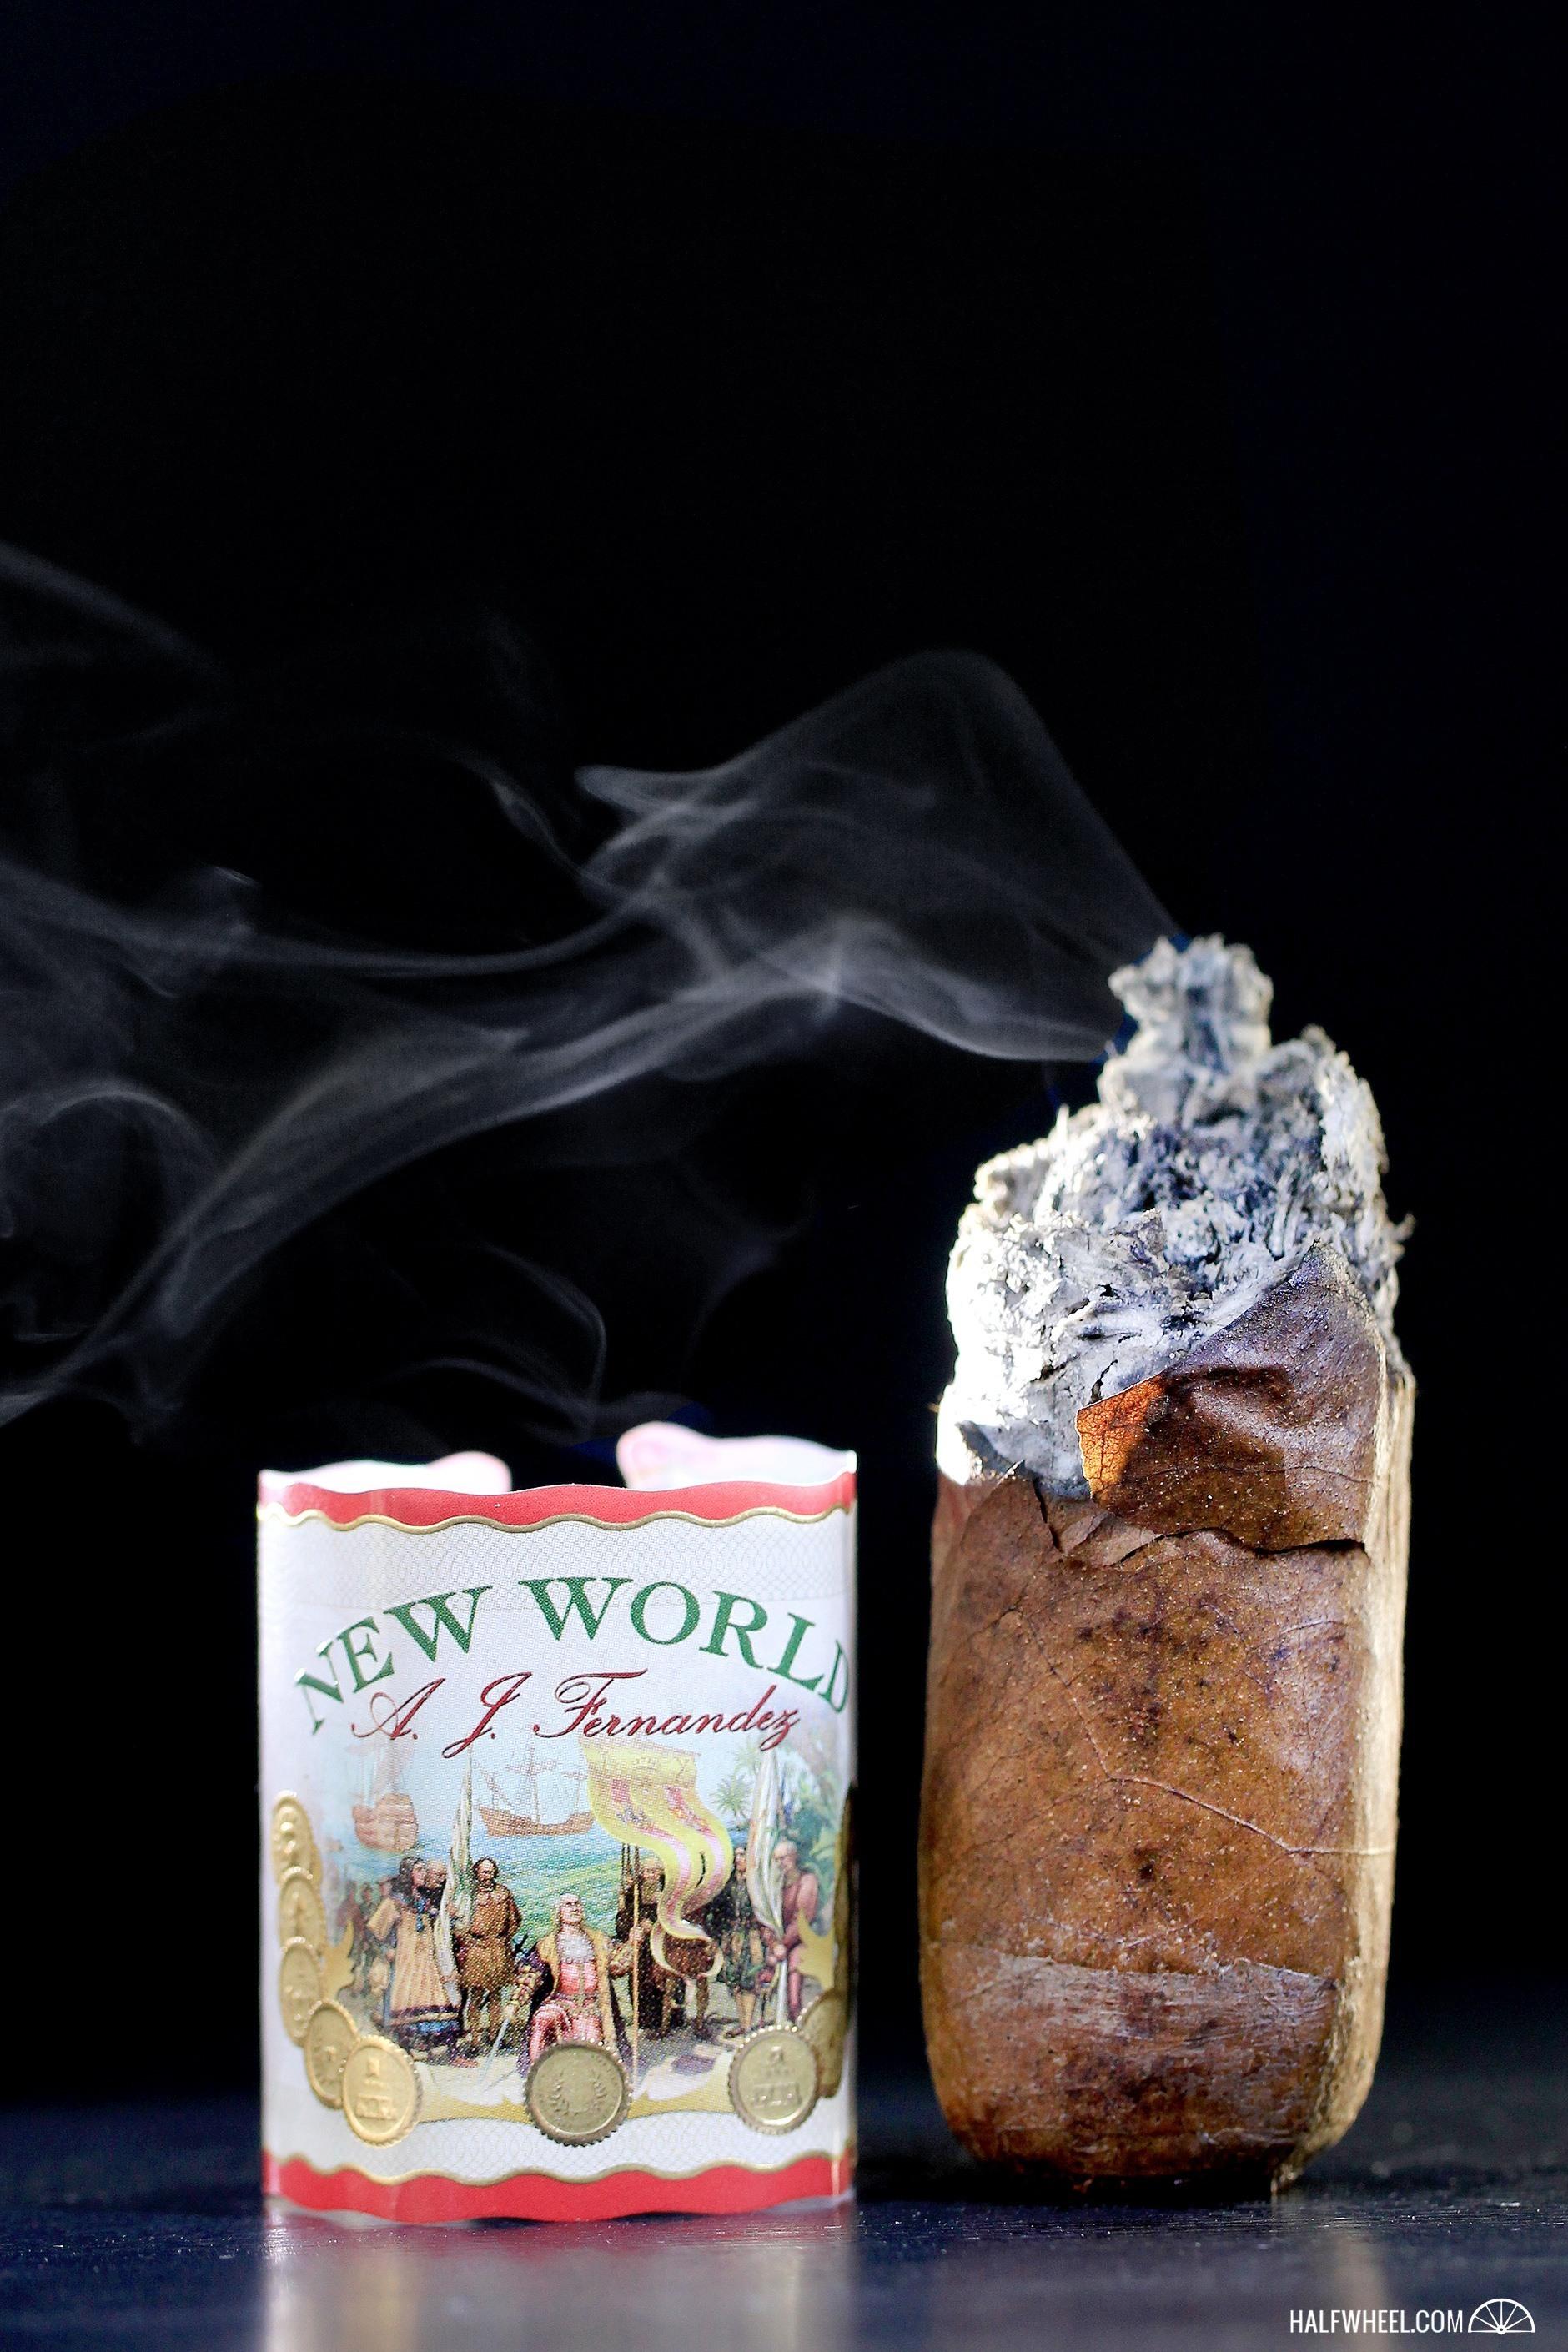 A.J. Fernandez New World Brute 4